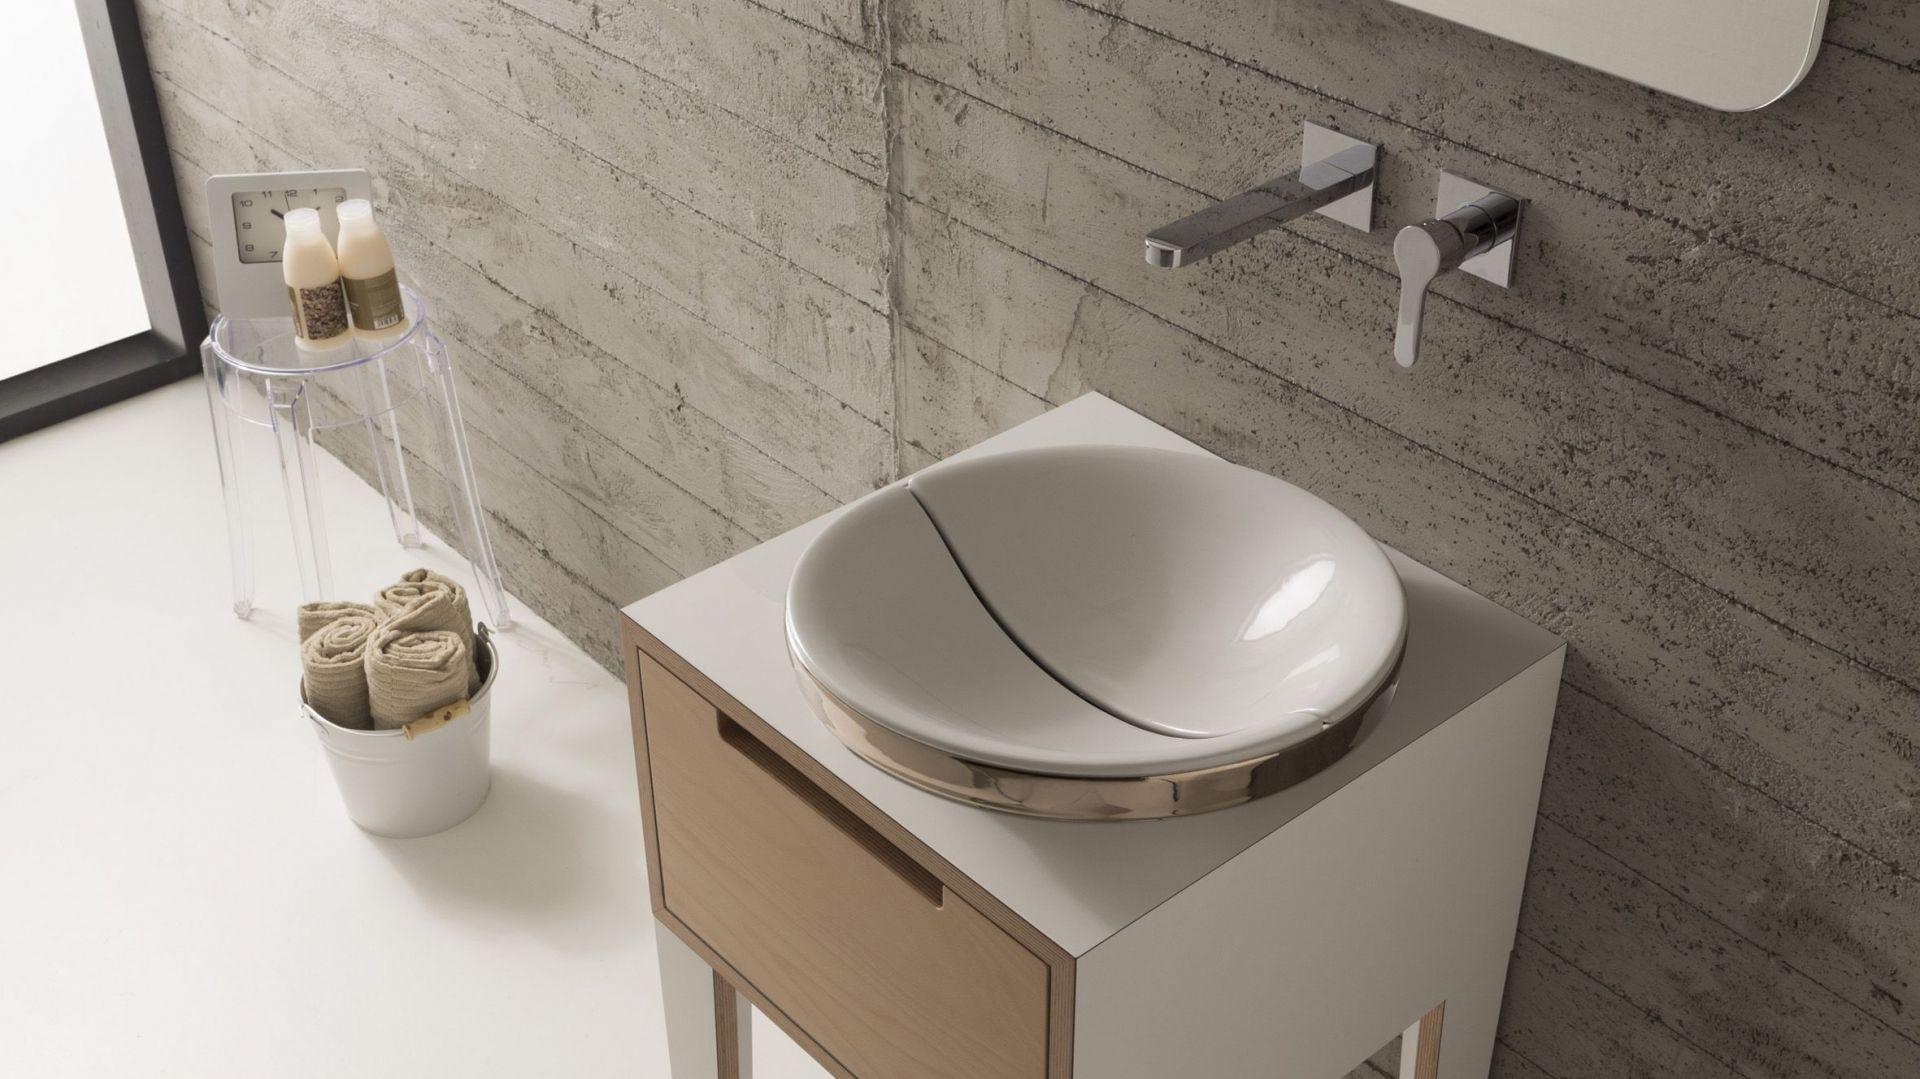 Okrągła umywalka z serii Mizu marki Scarabeo Ceramiche. Fot. Scarabeo Ceramiche